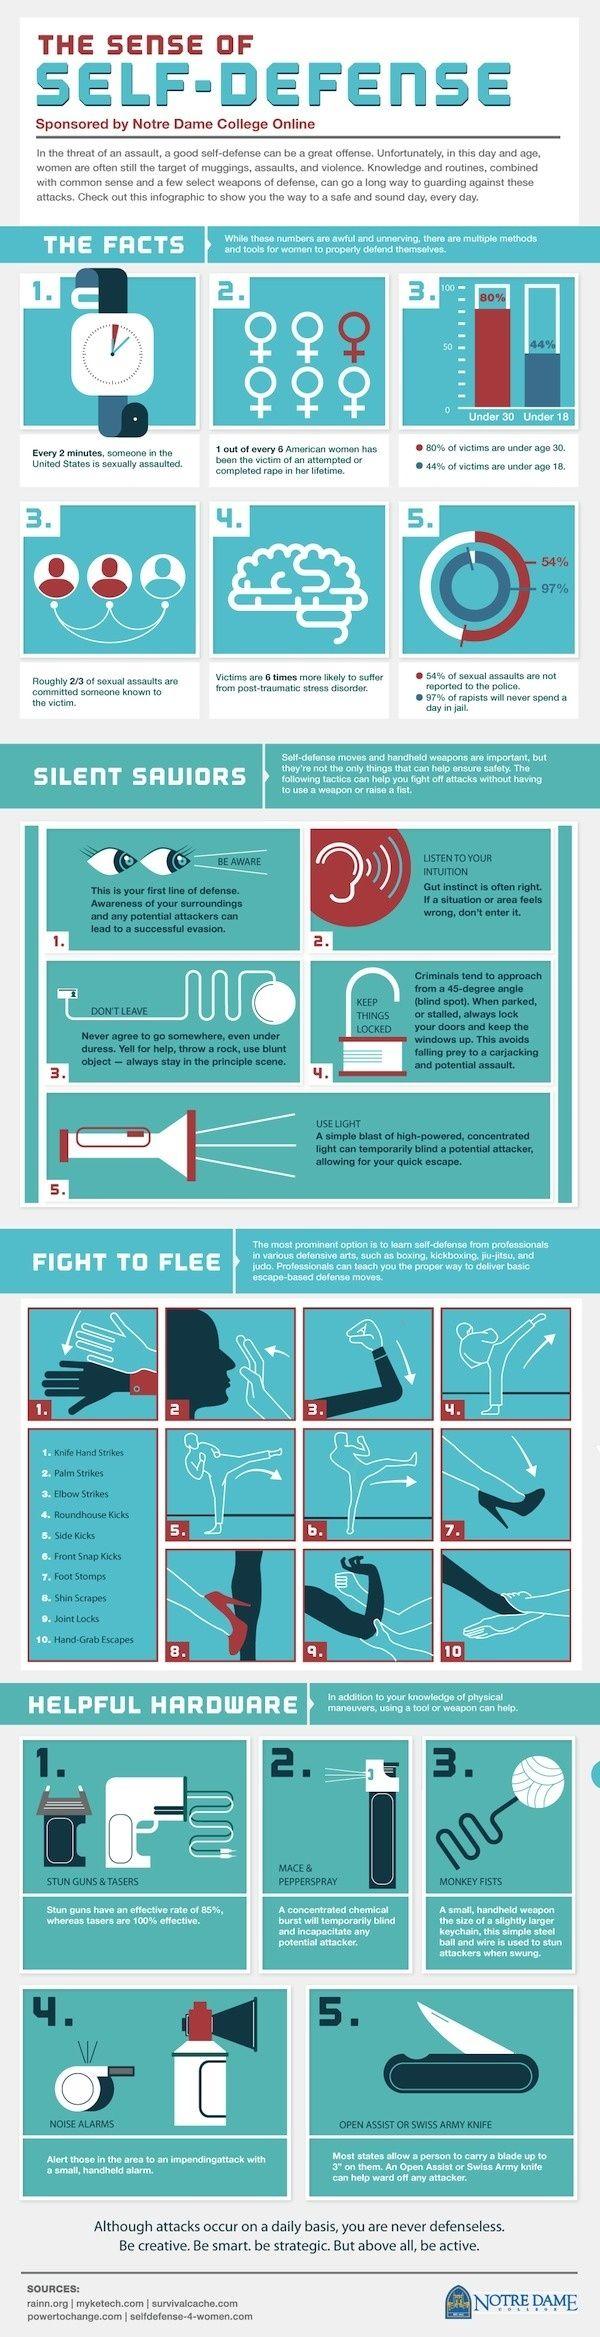 The Sense of Self Defense   Infographic